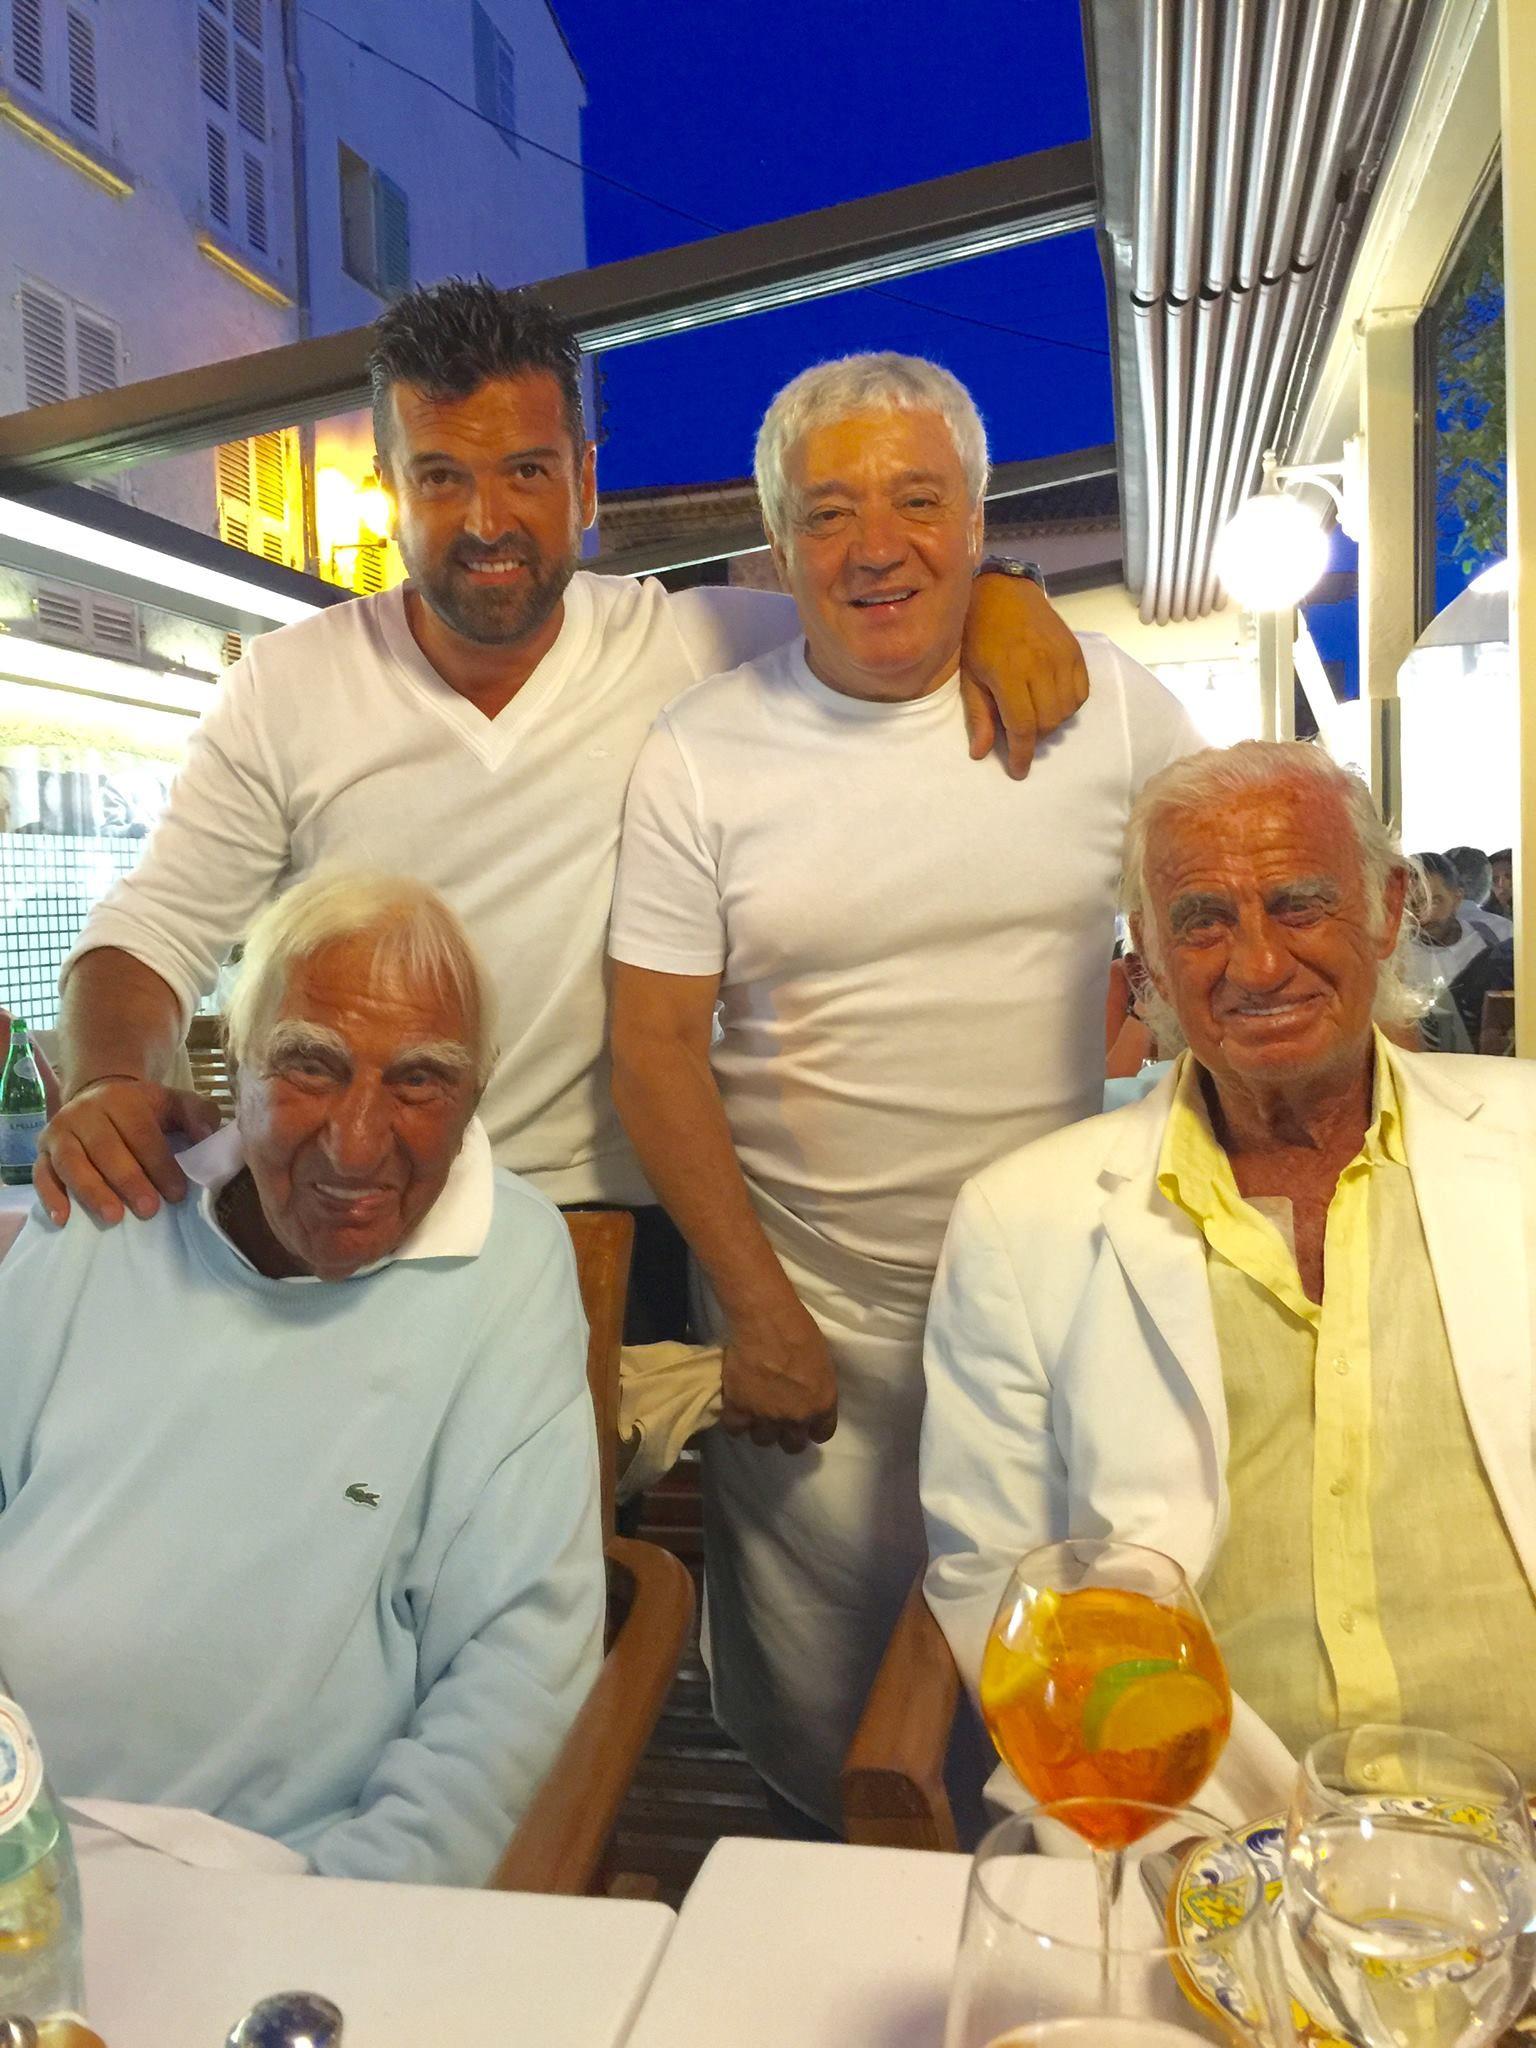 Jean- Paul Belmondo and Charles Gerard . Antibes . August 2016 .